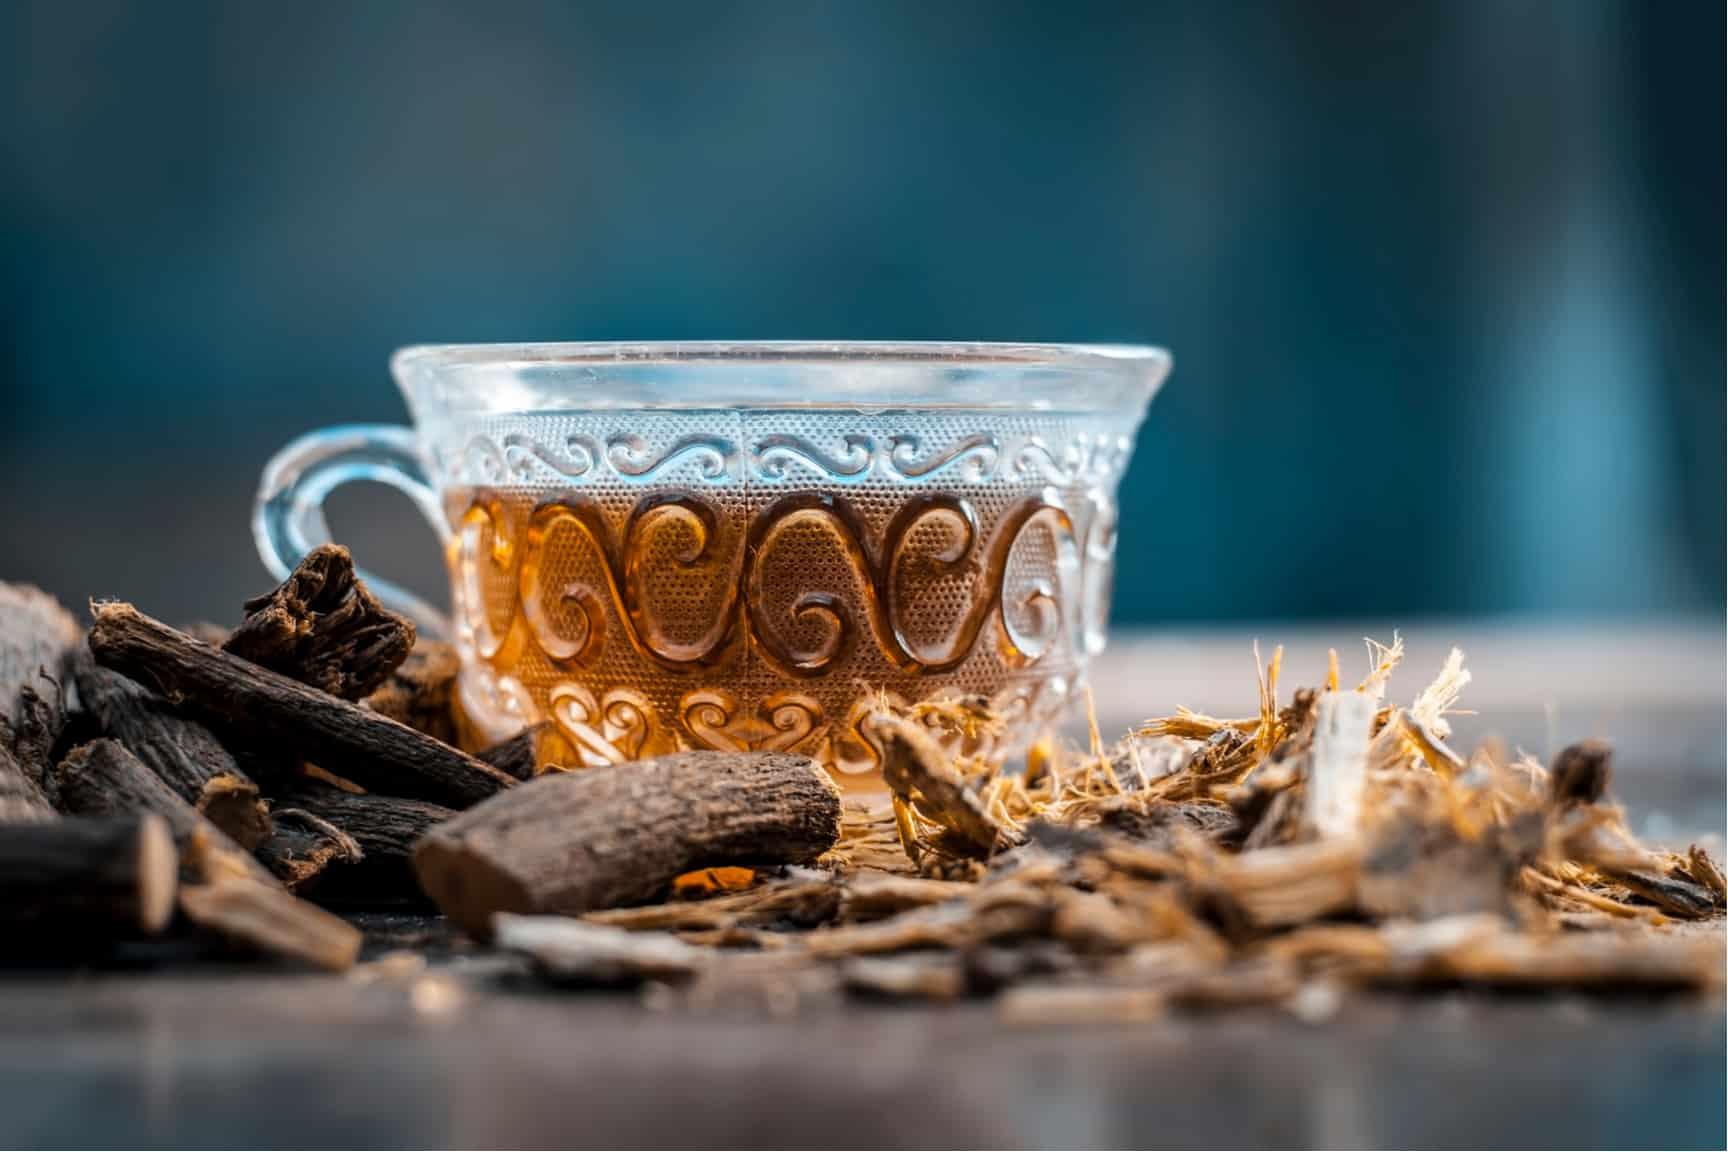 liquorice-root-tea-8872359